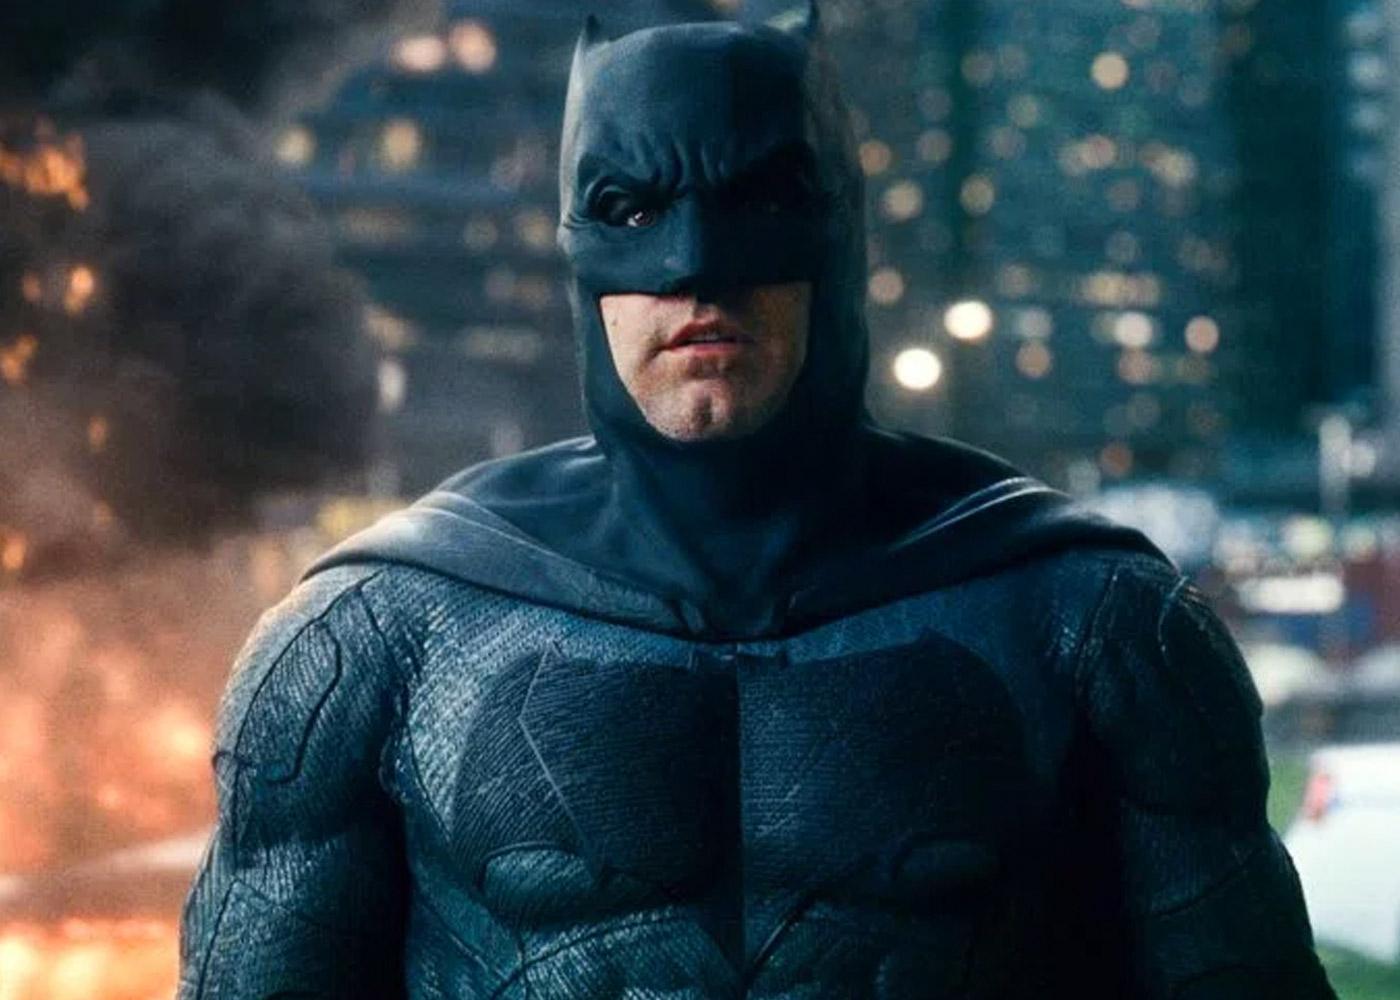 Ben affleck - Justice League